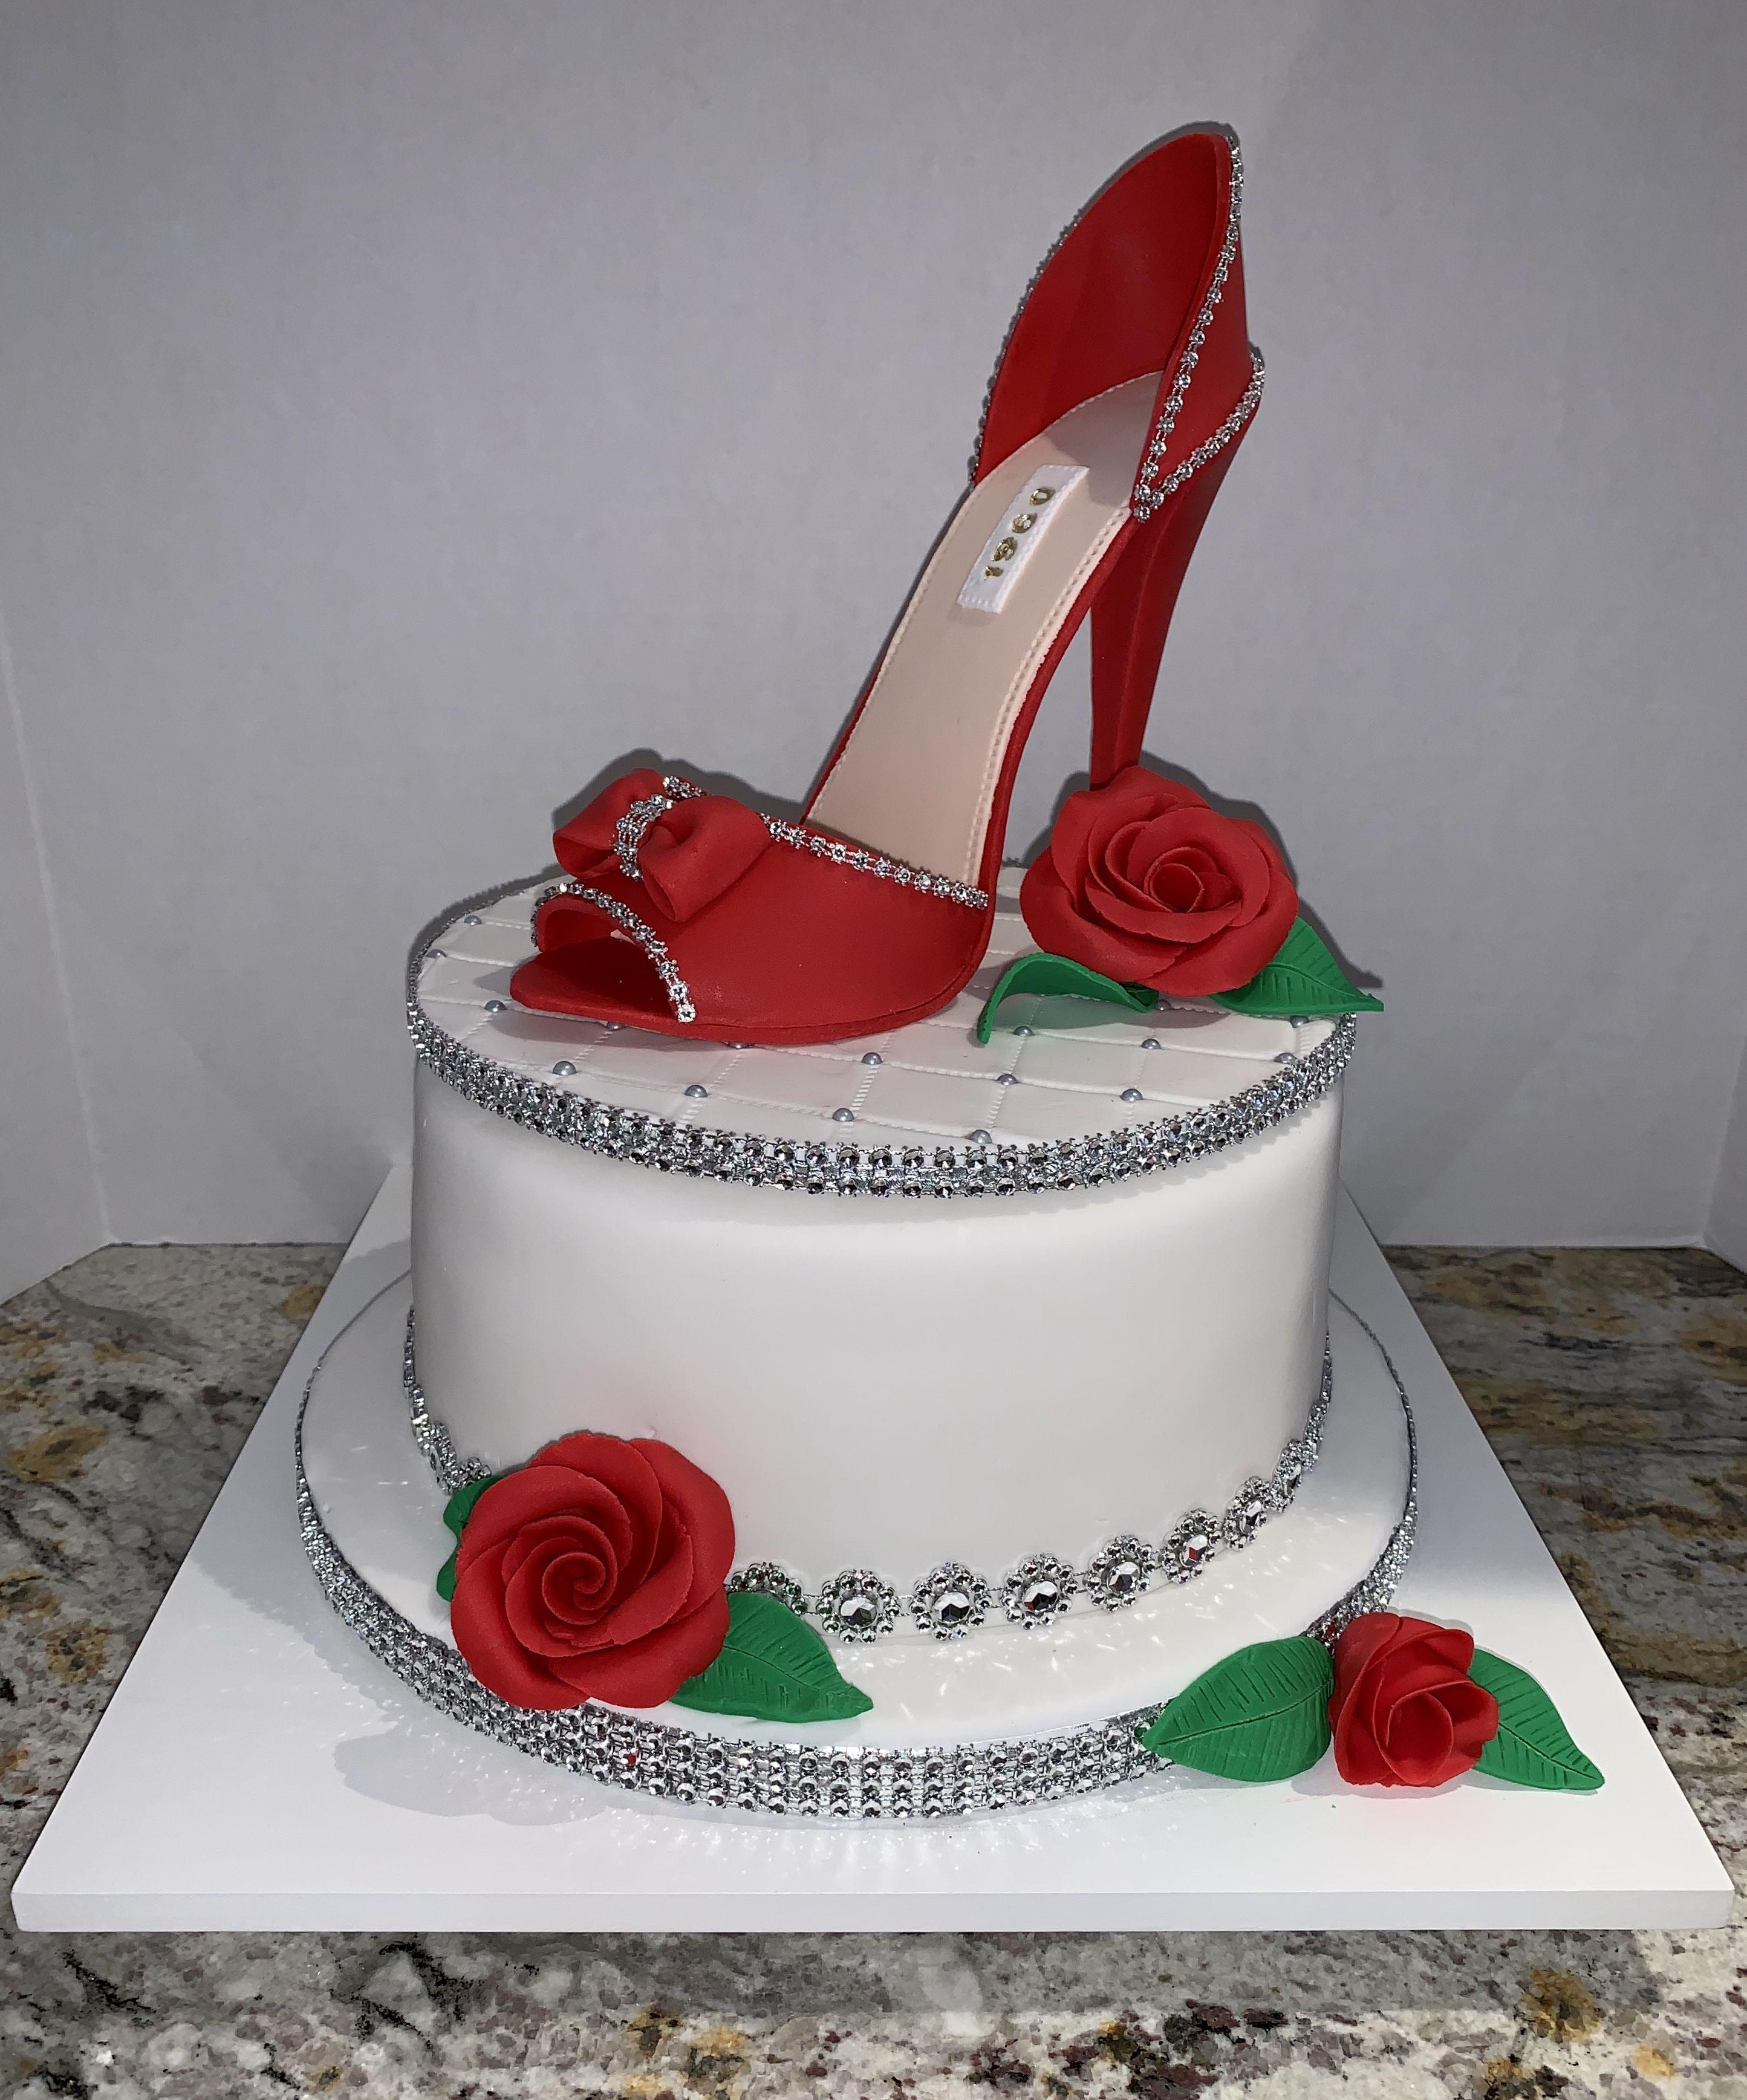 Fondant High Heel Shoe Cake Source by 483groupinc #stiletto